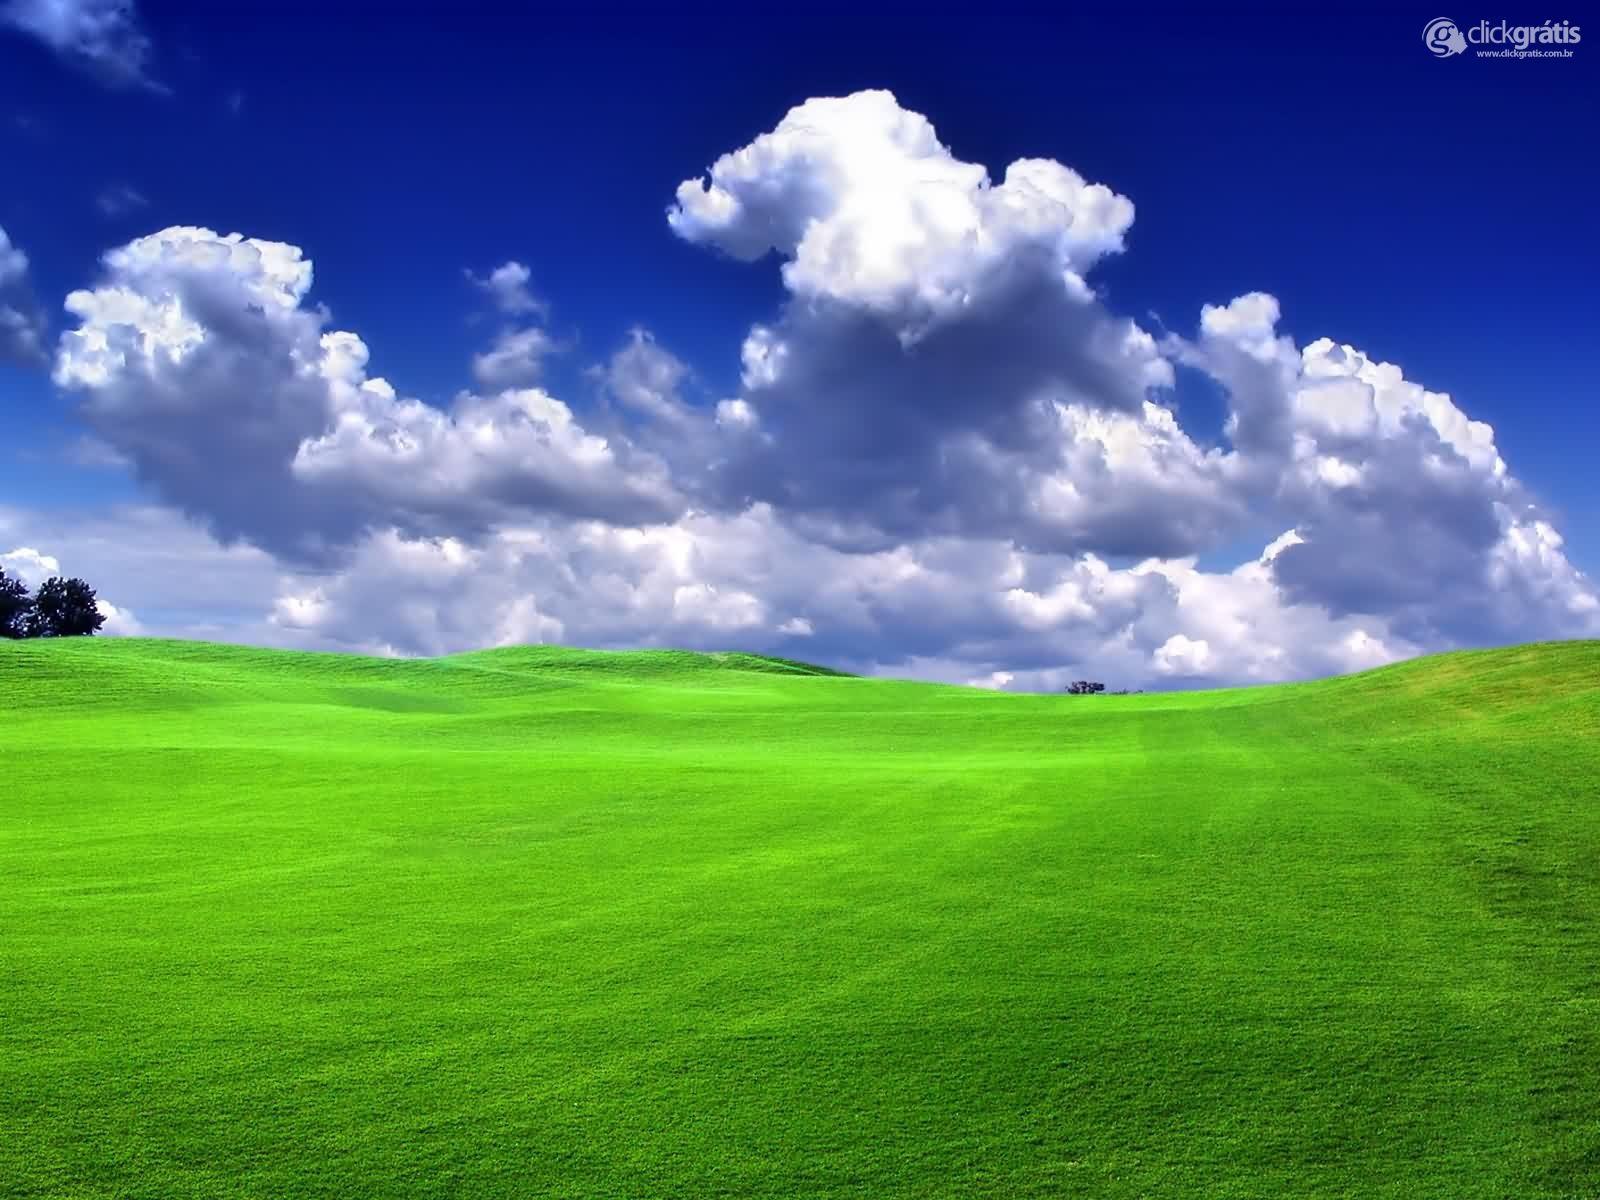 Gramado e Nuvens